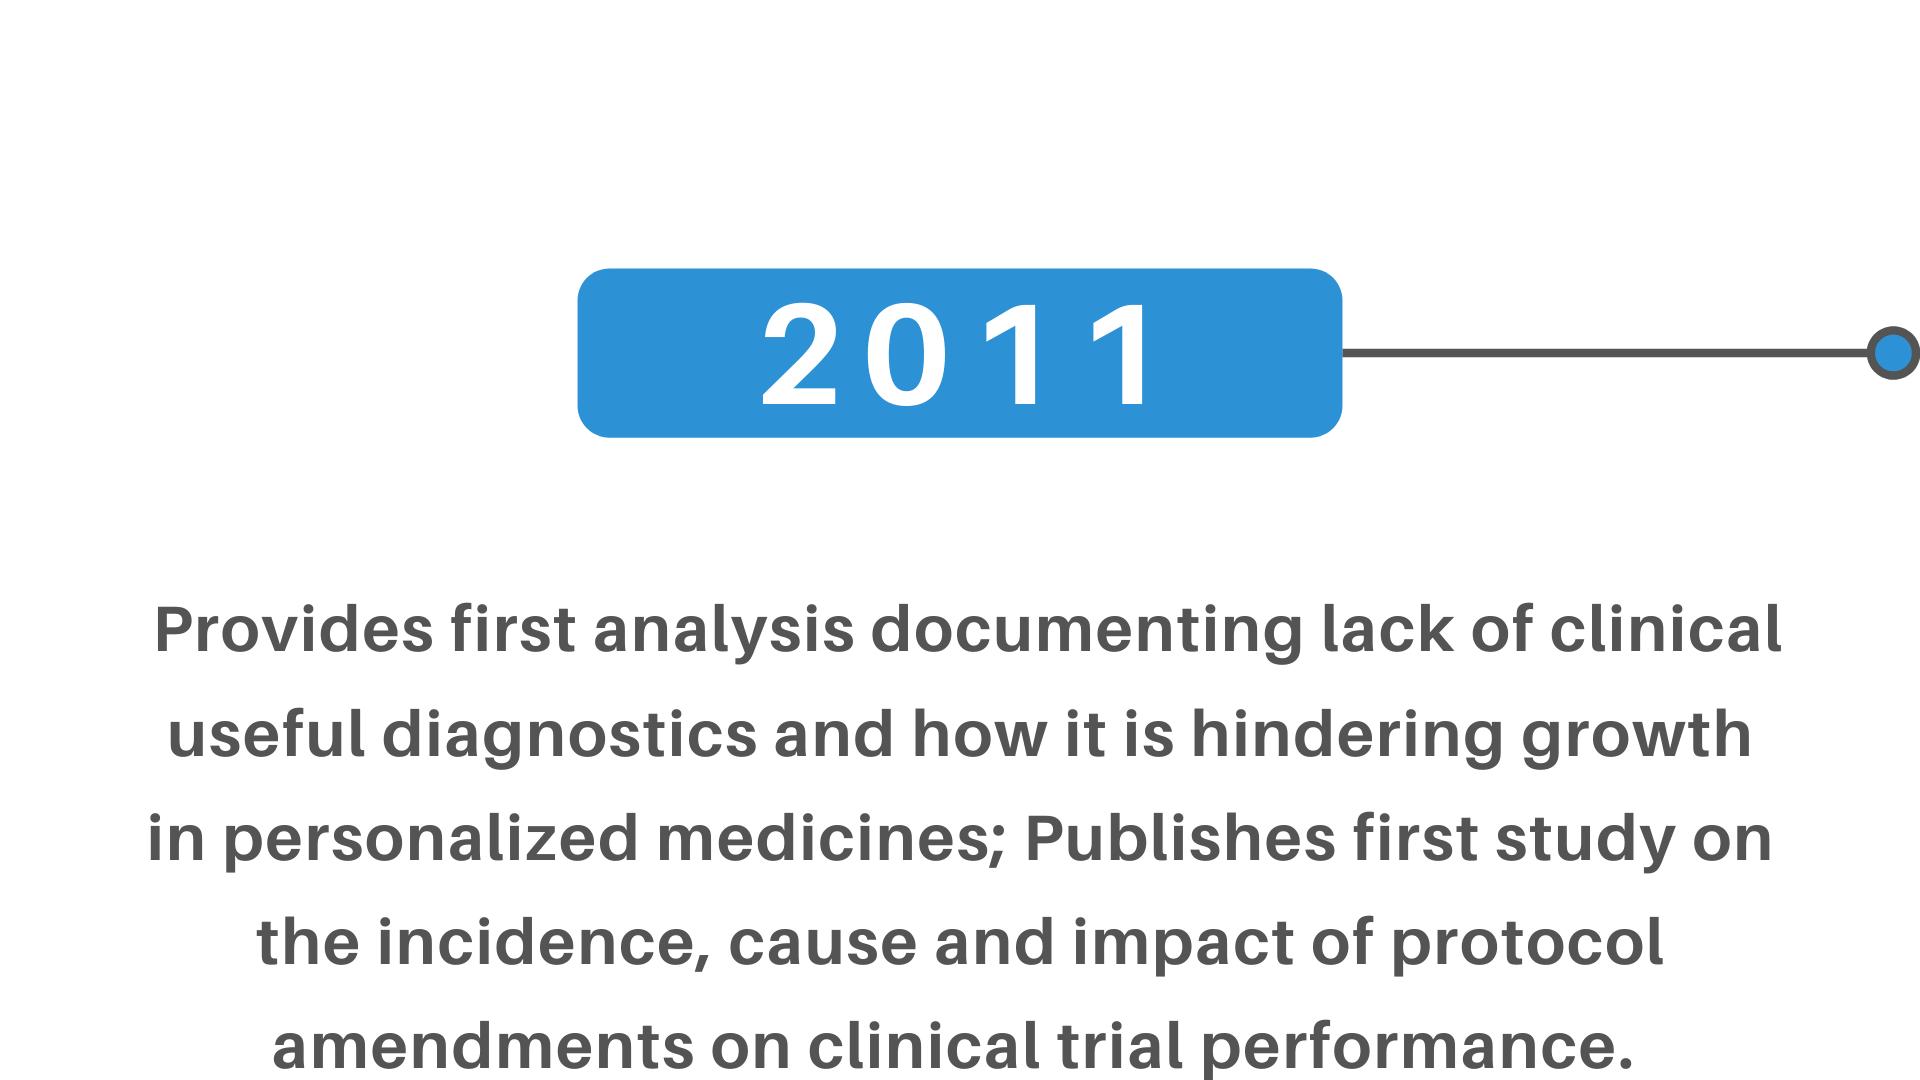 clinical useful diagnostics personalized medicines incidence protocol